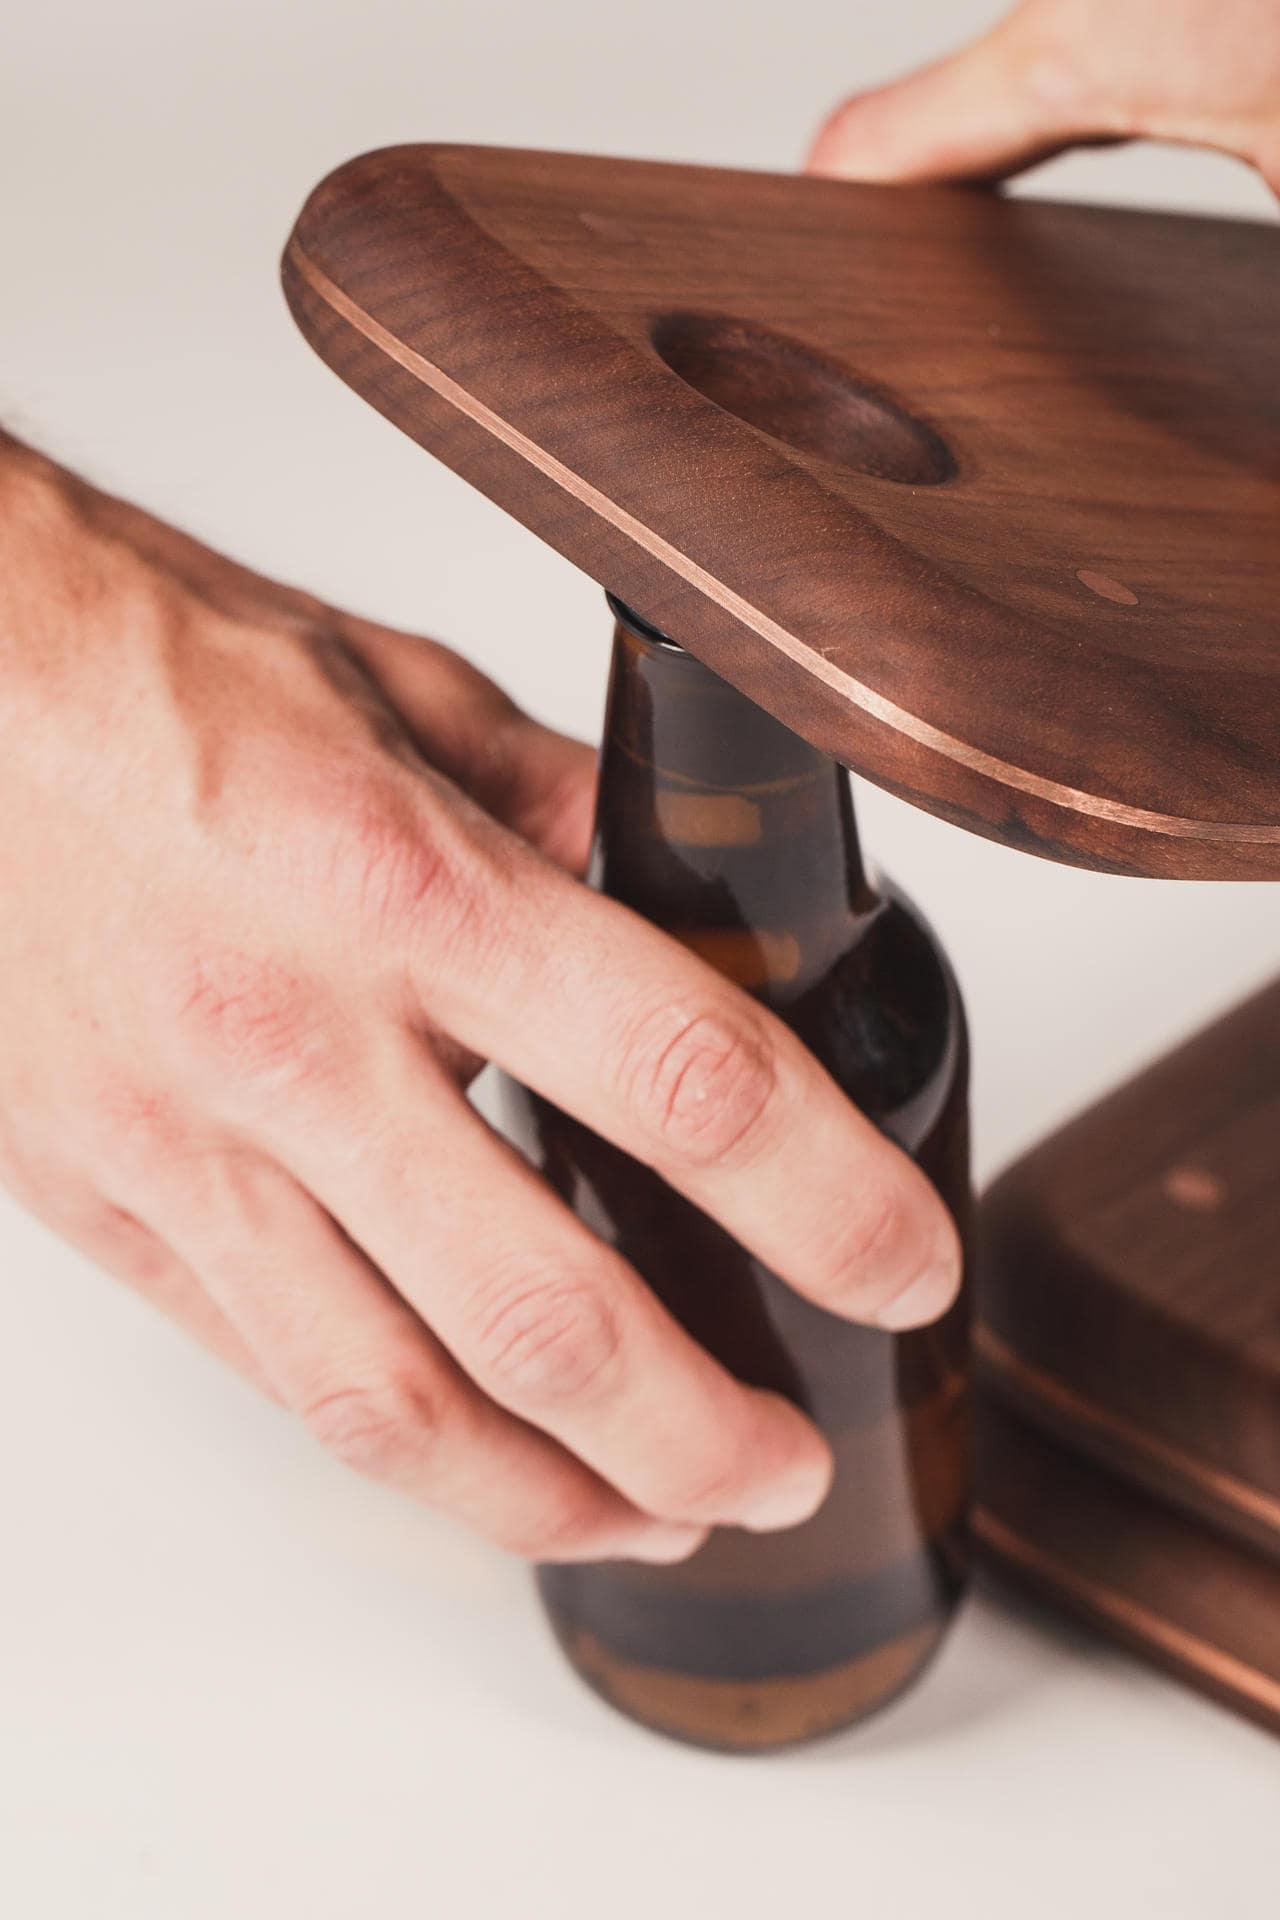 Holt Chop Pop Boards Georg Kettele Cutting Boards 9